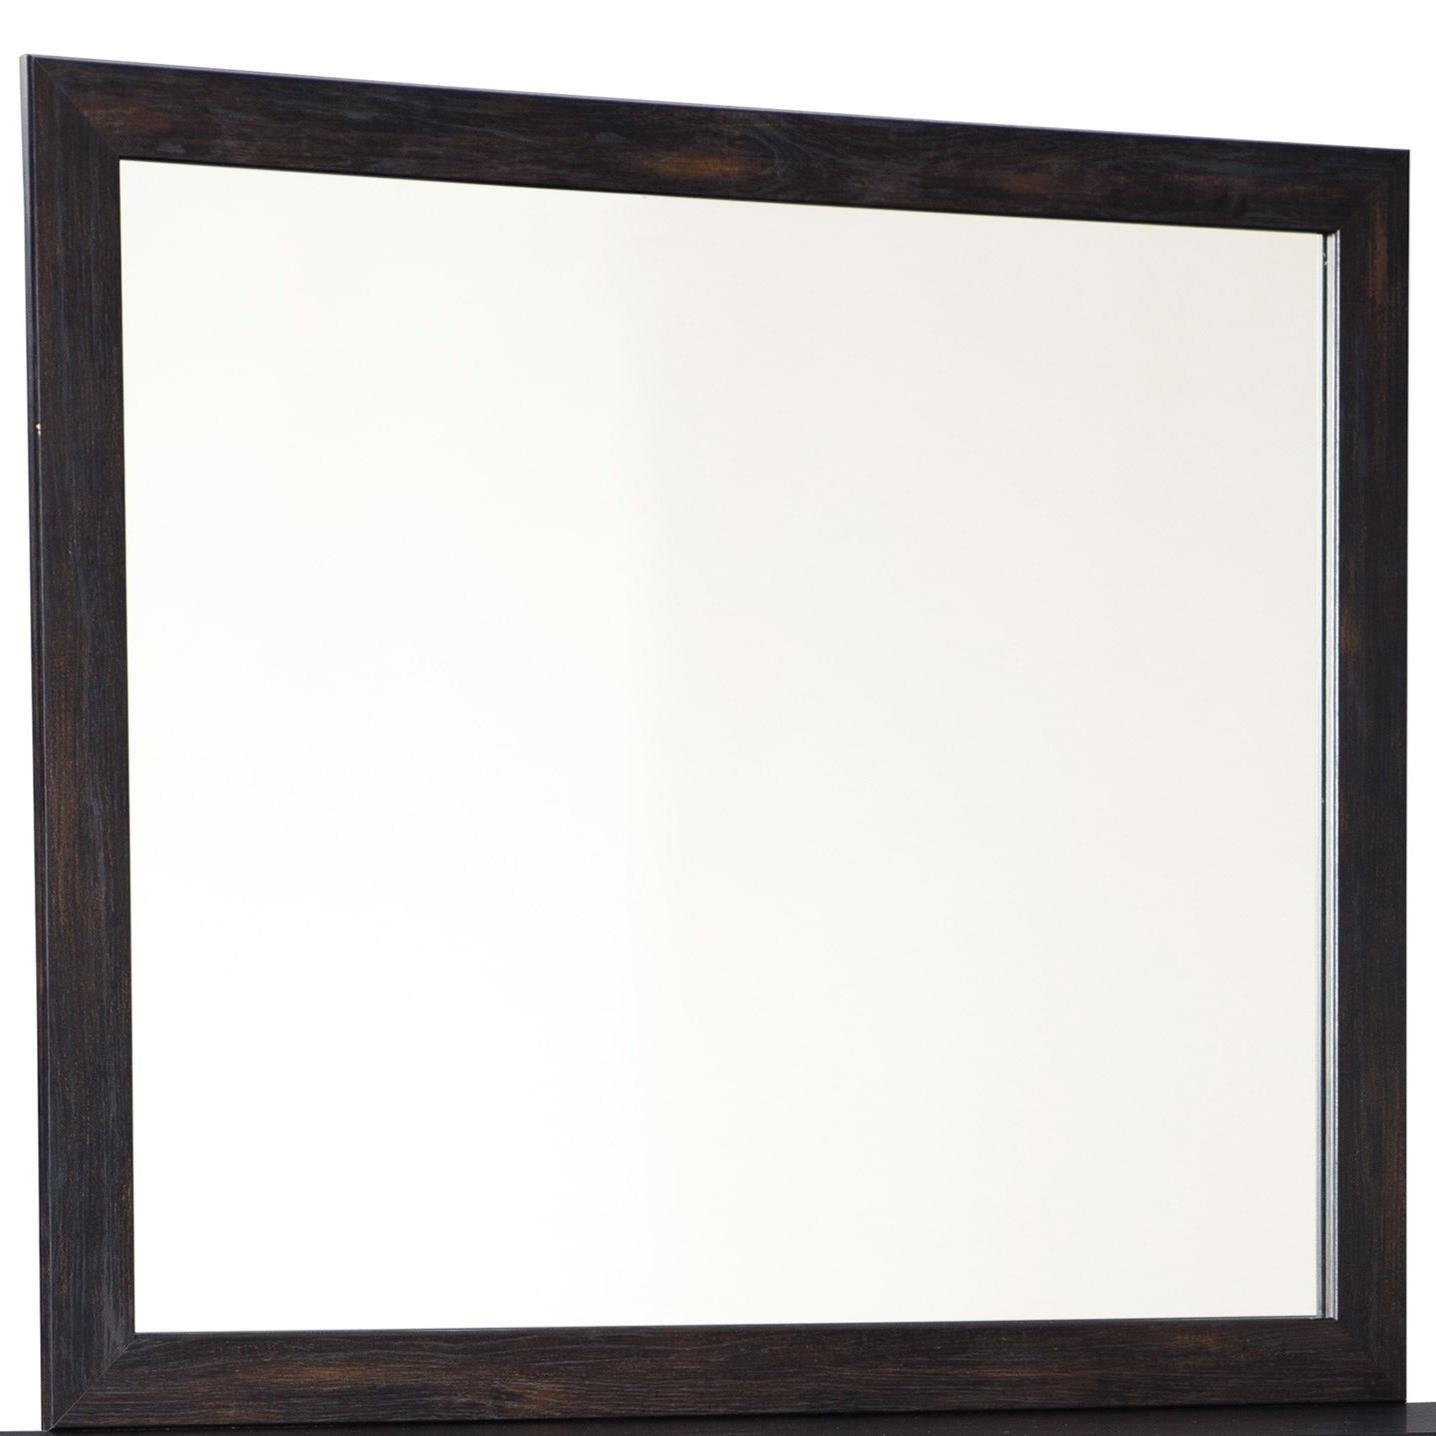 Reylow Bedroom Mirror by Ashley (Signature Design) at Johnny Janosik